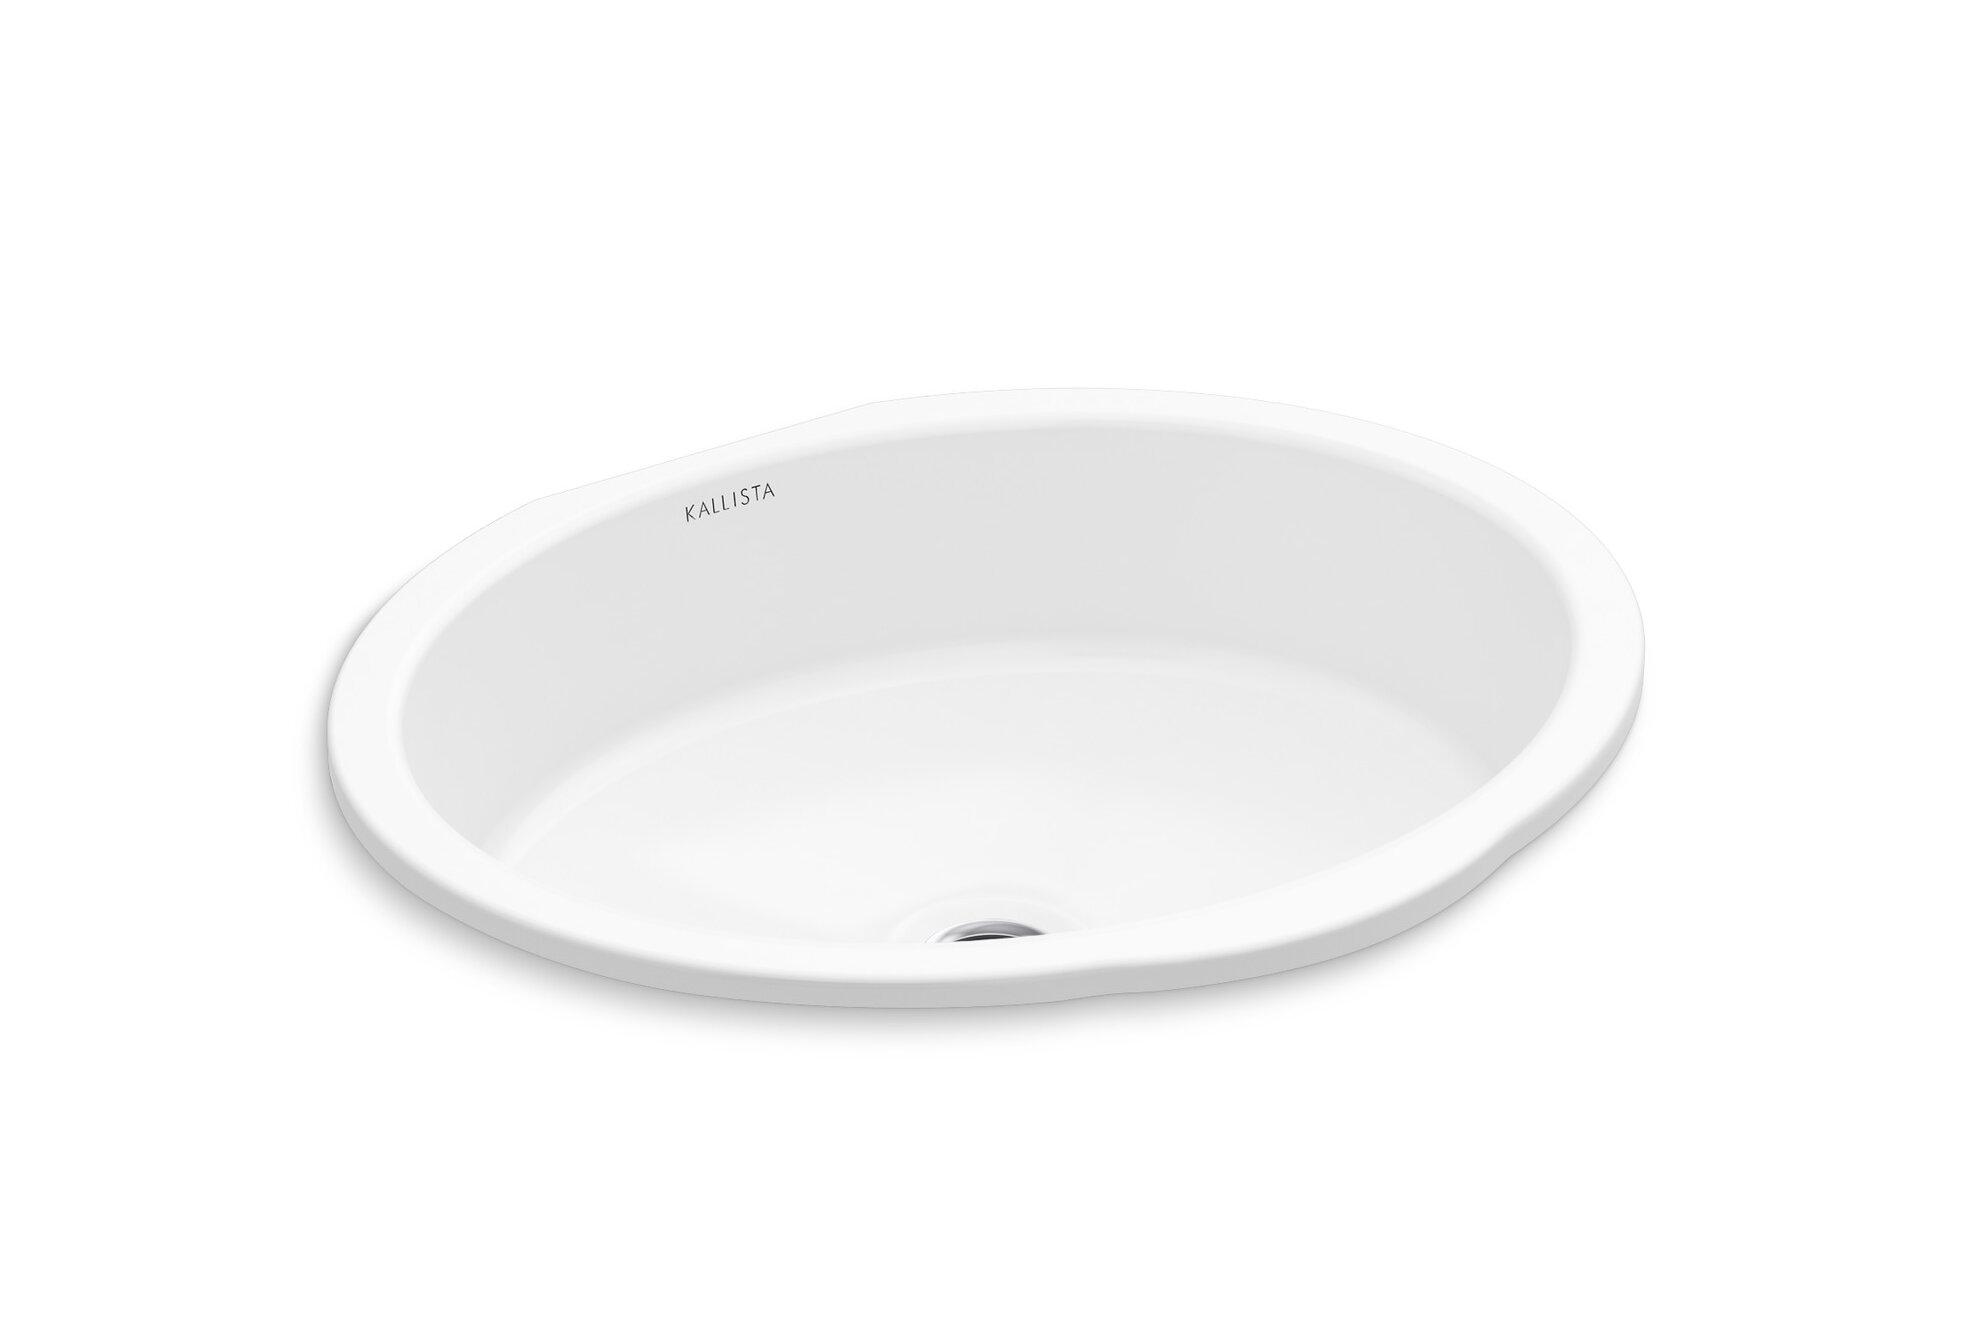 Kallista Perfect Centric Oval Undermount Bathroom Sink with Overflow ...